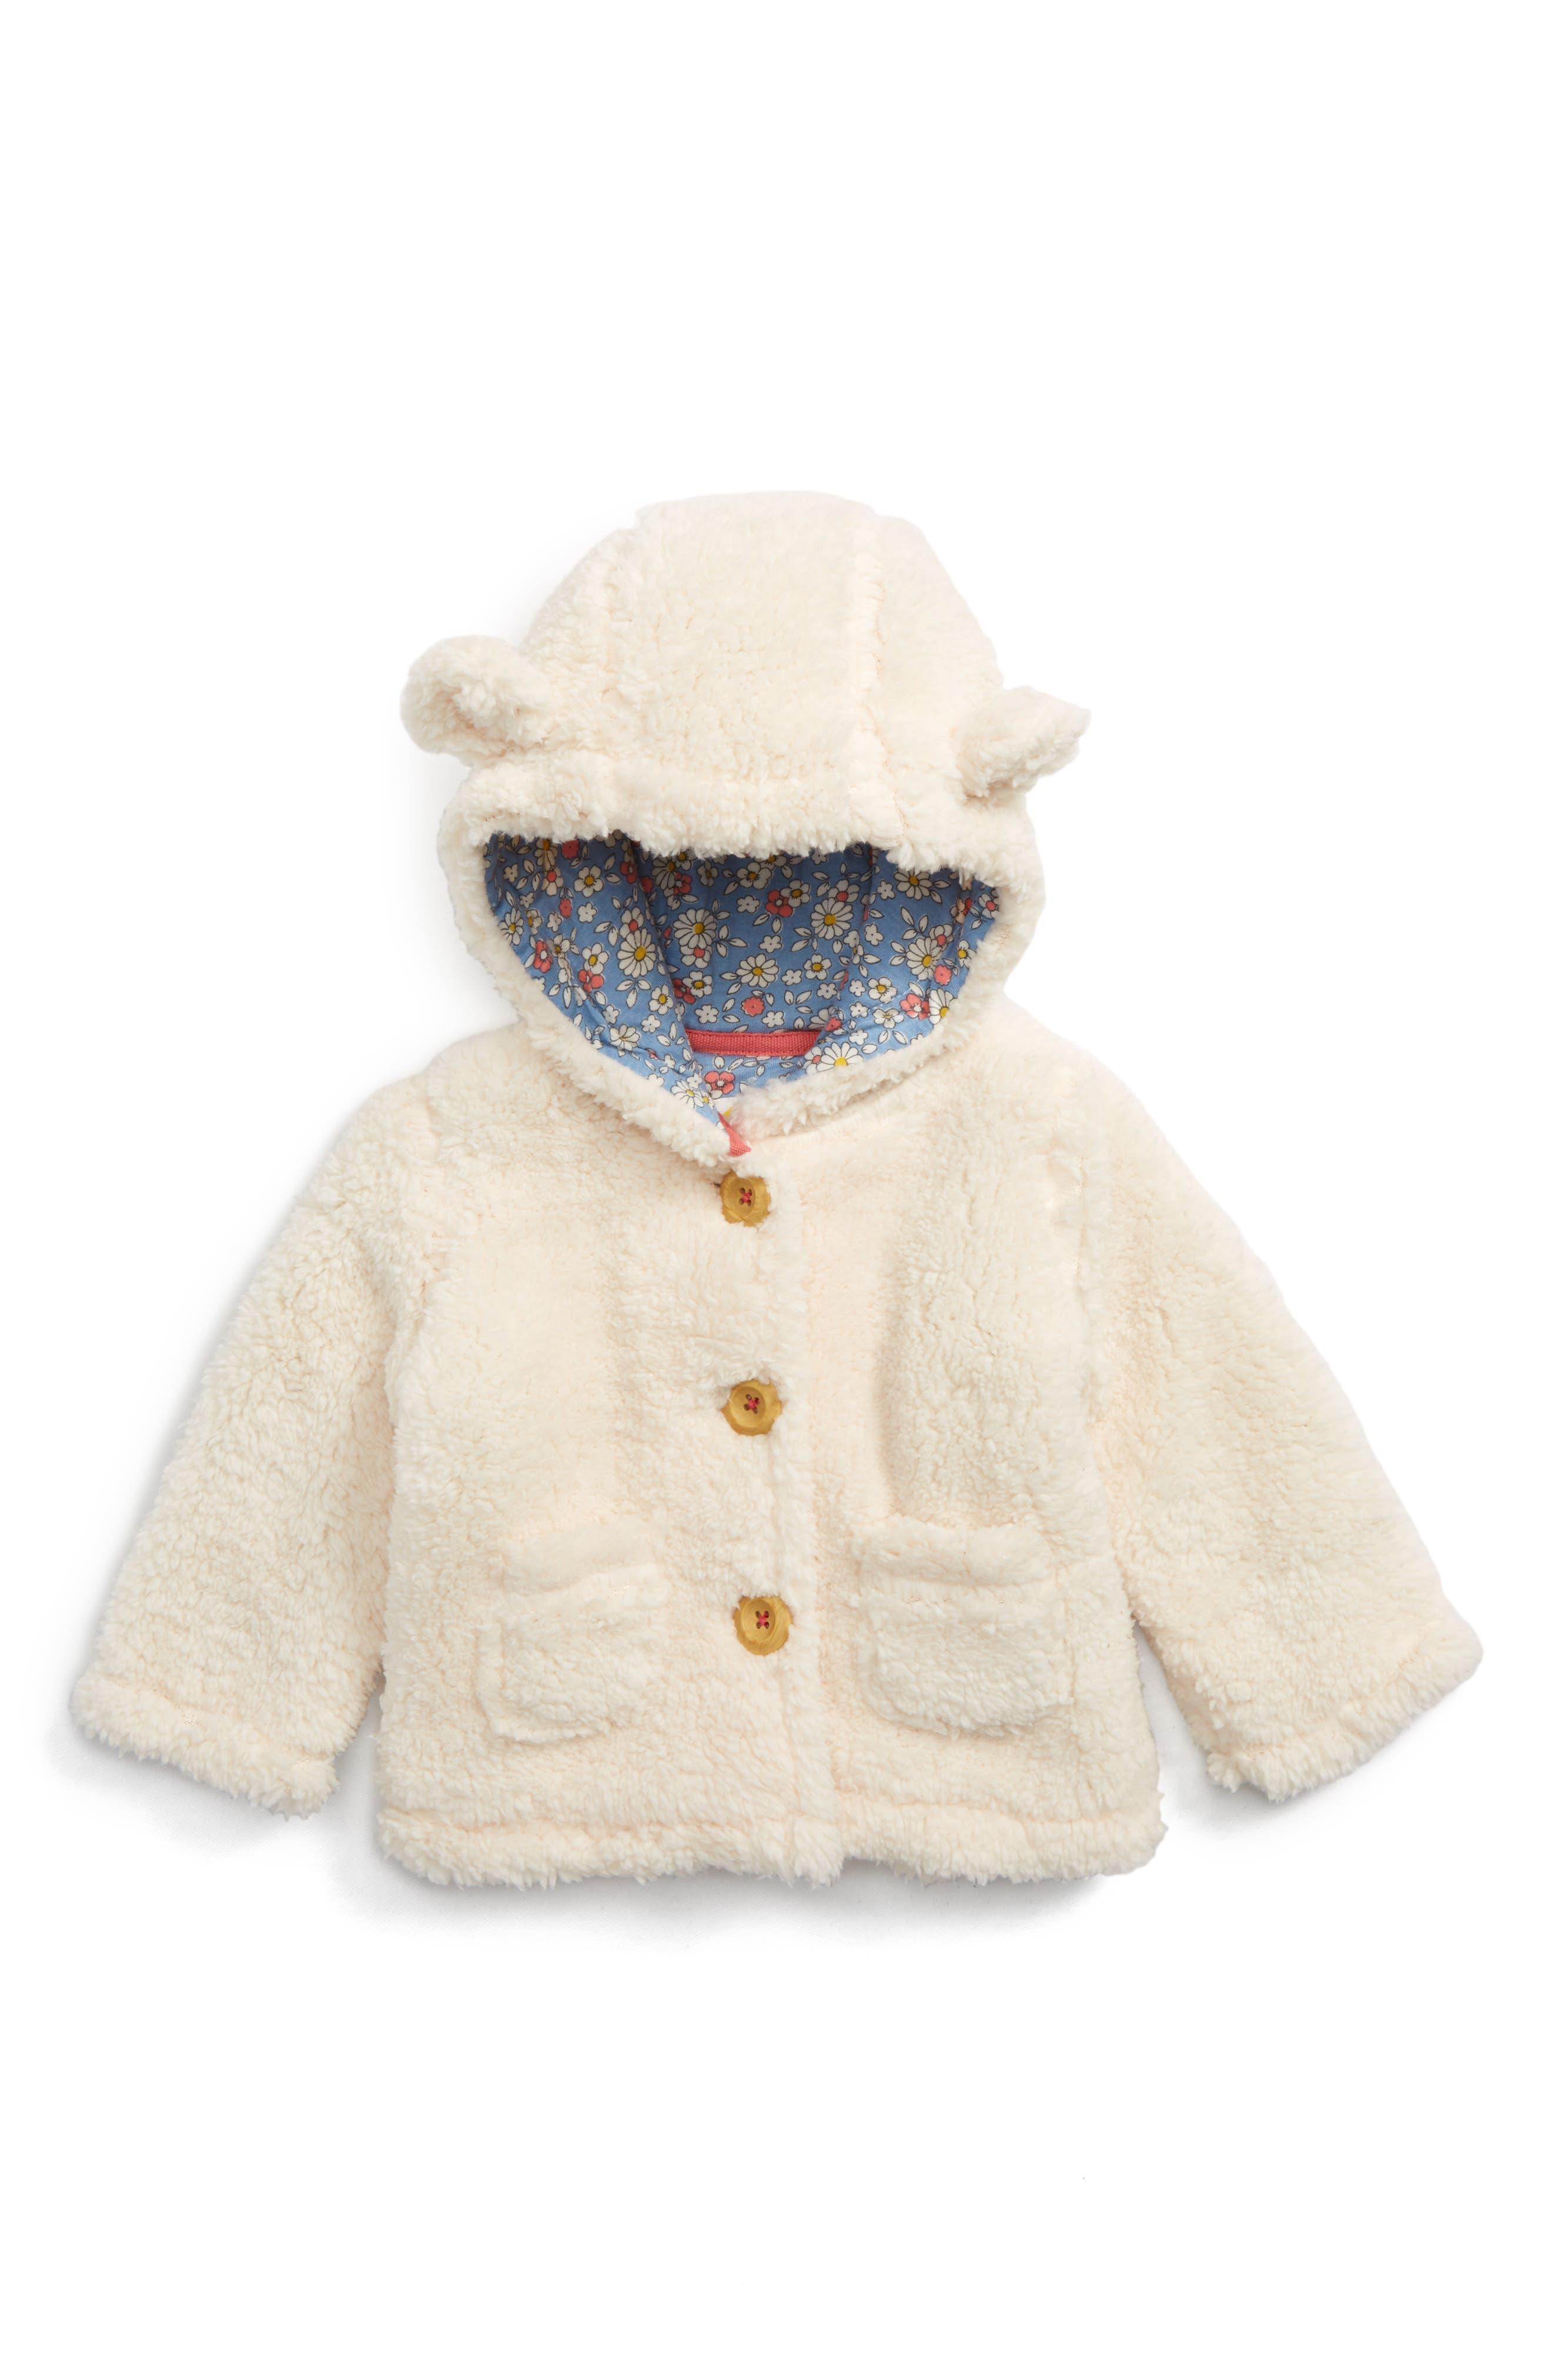 MINI BODEN,                             Teddy Bear Hooded Jacket,                             Main thumbnail 1, color,                             900